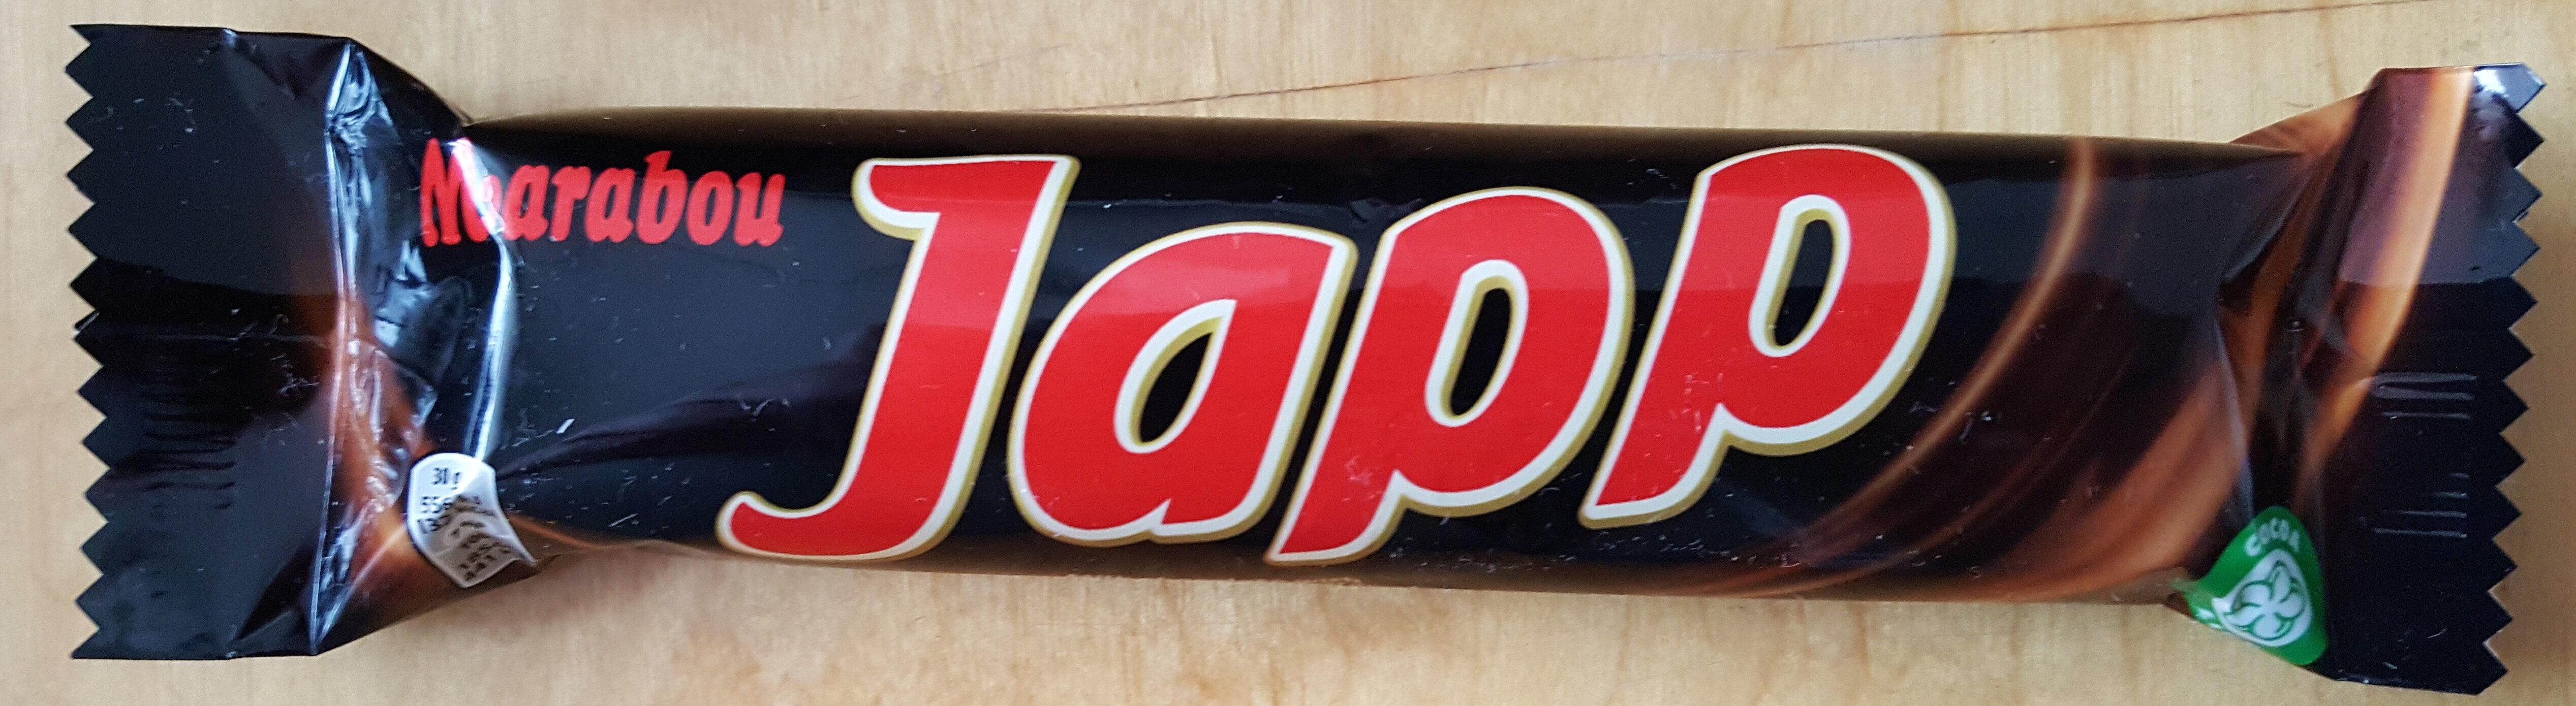 Japp - Product